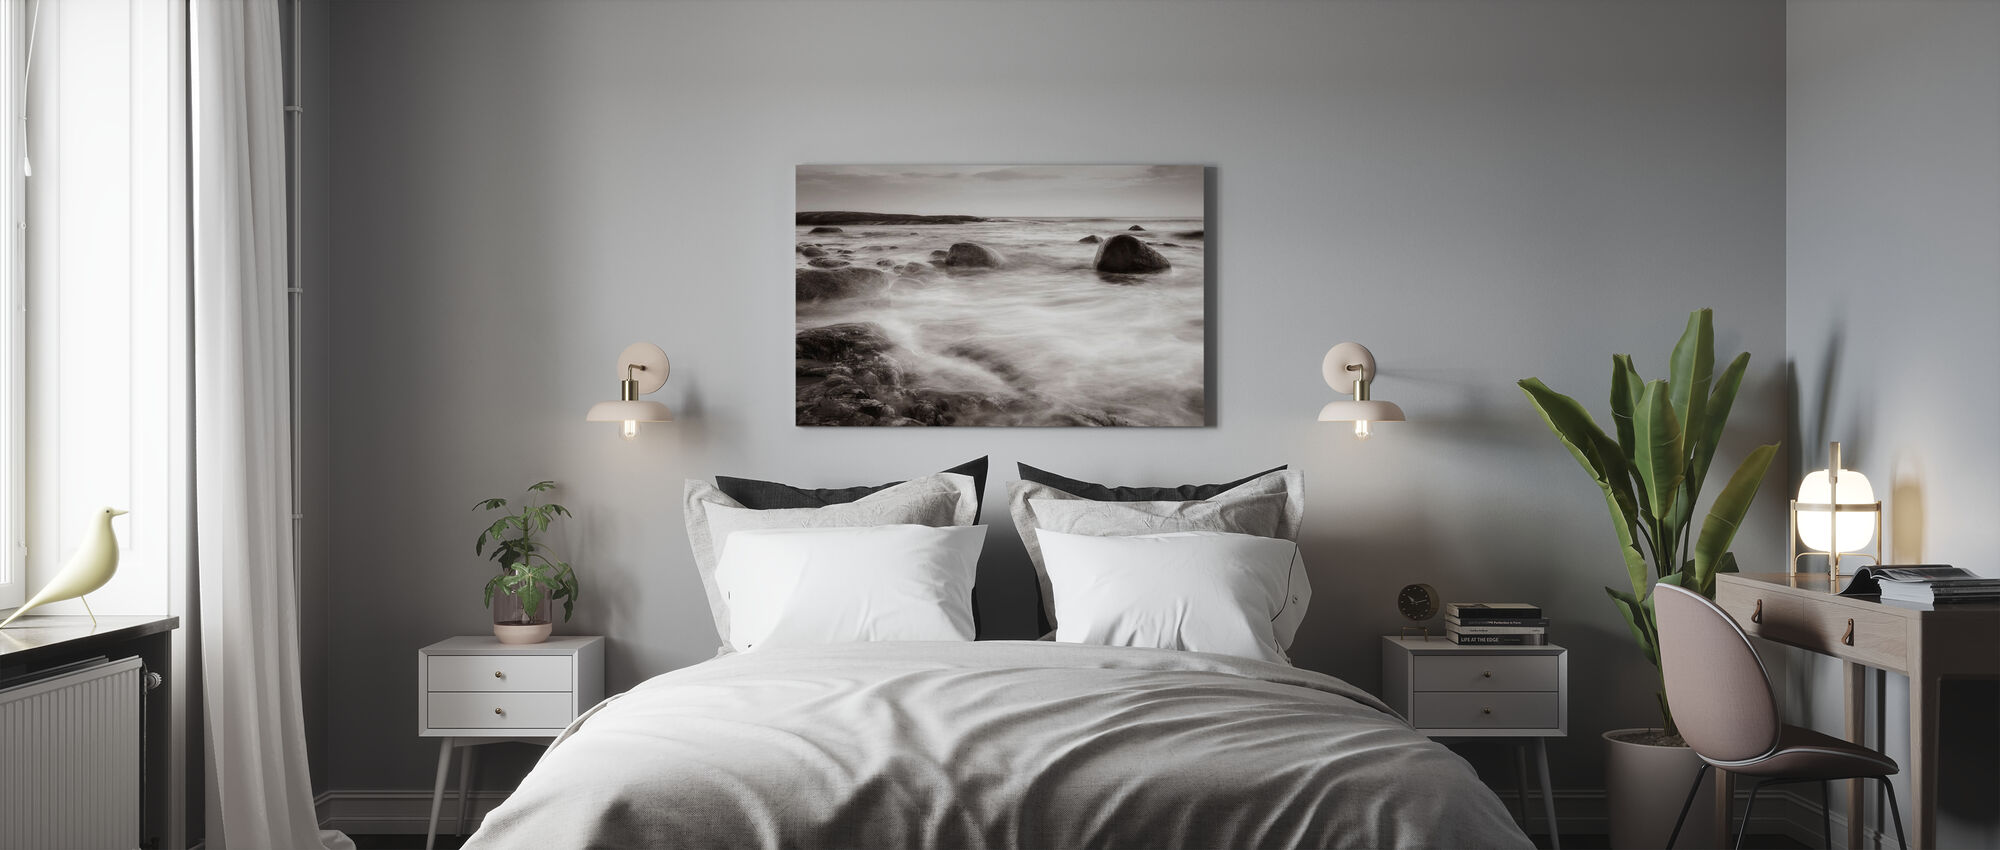 Stroom - Canvas print - Slaapkamer